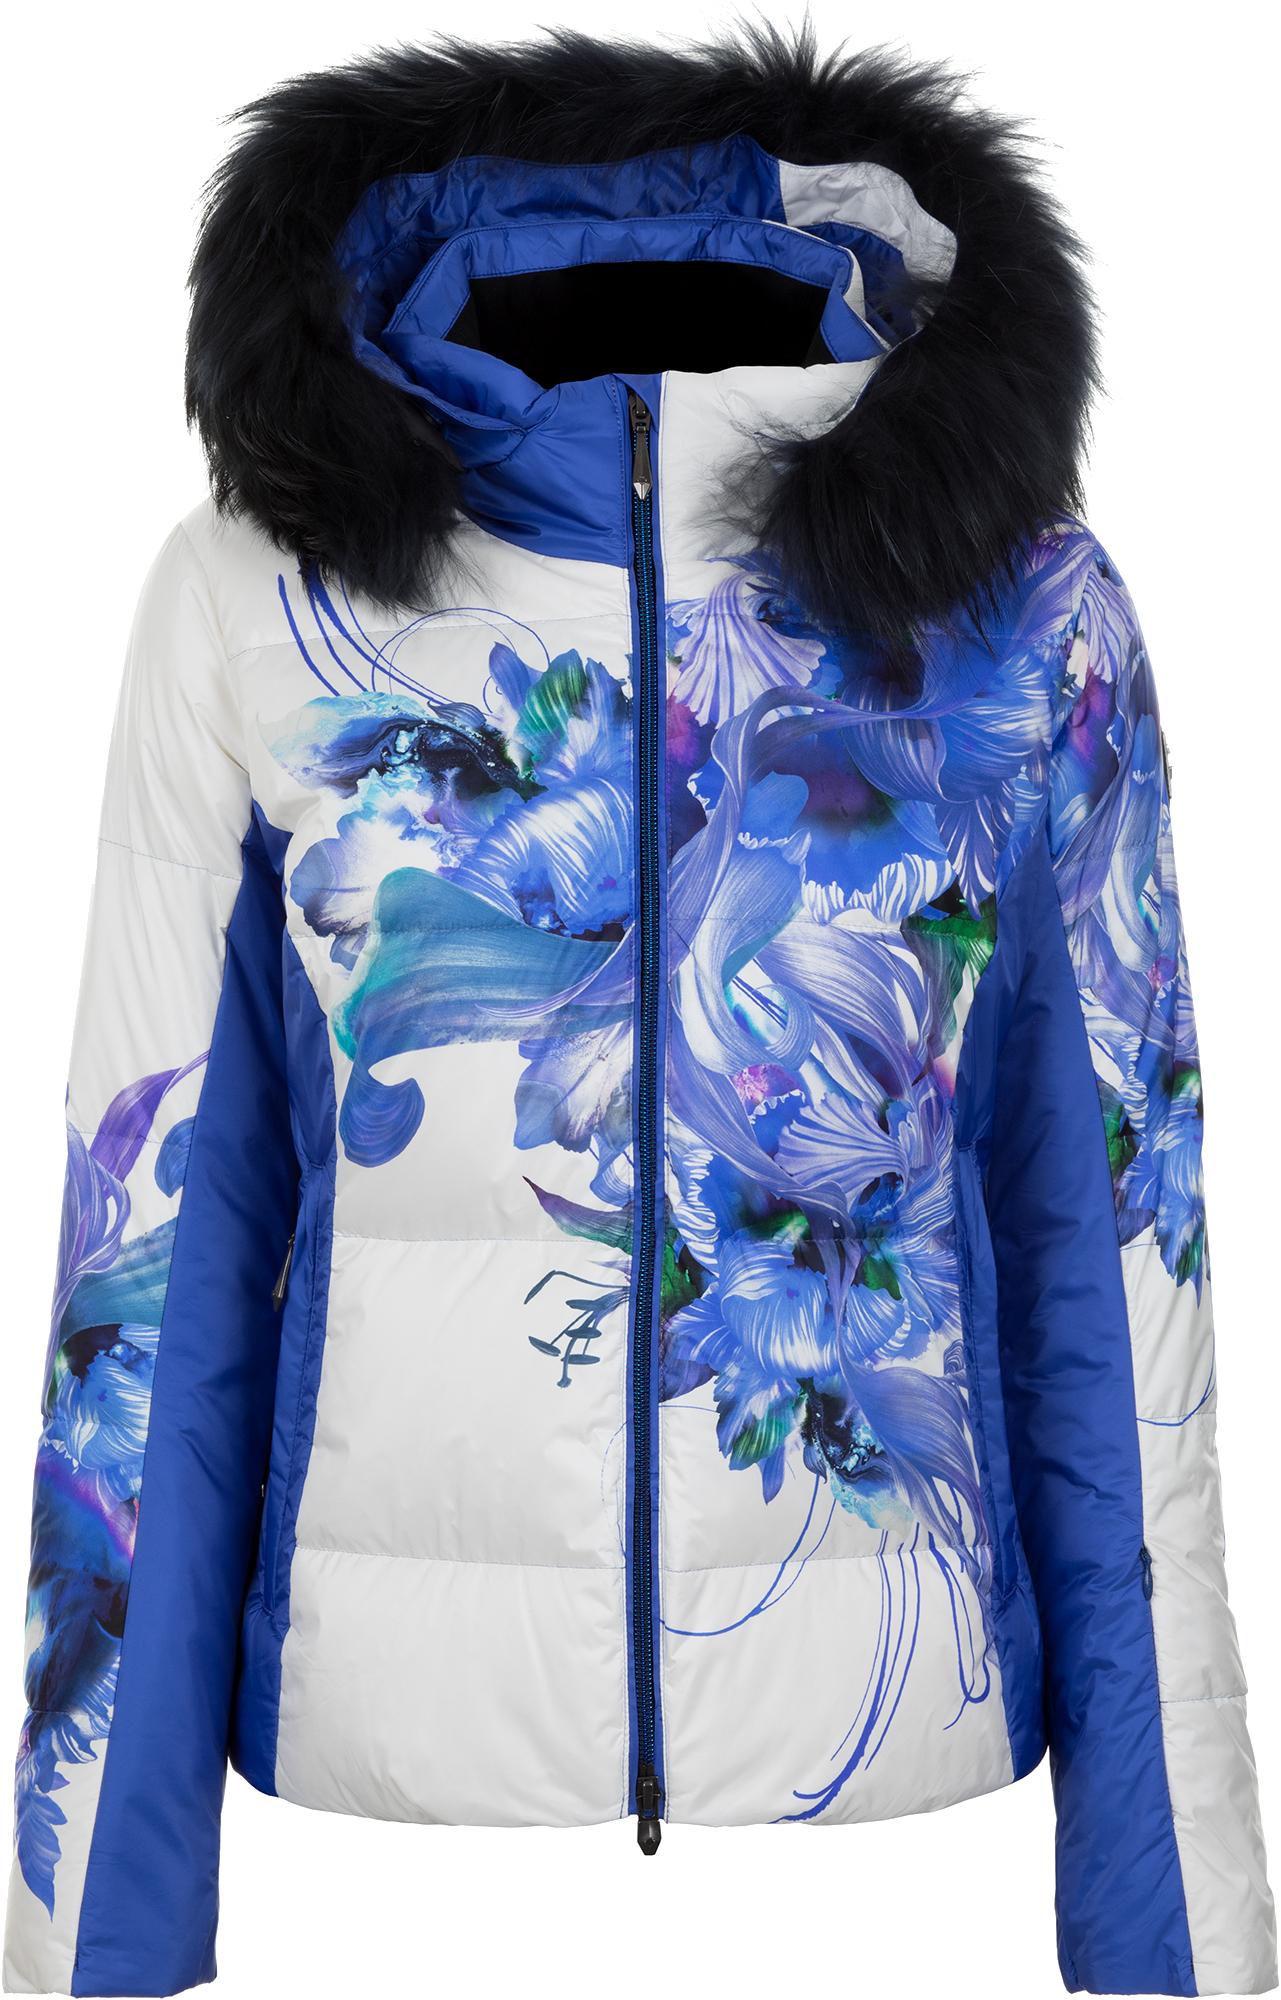 Descente Куртка пуховая женская Descente Hana, размер 46